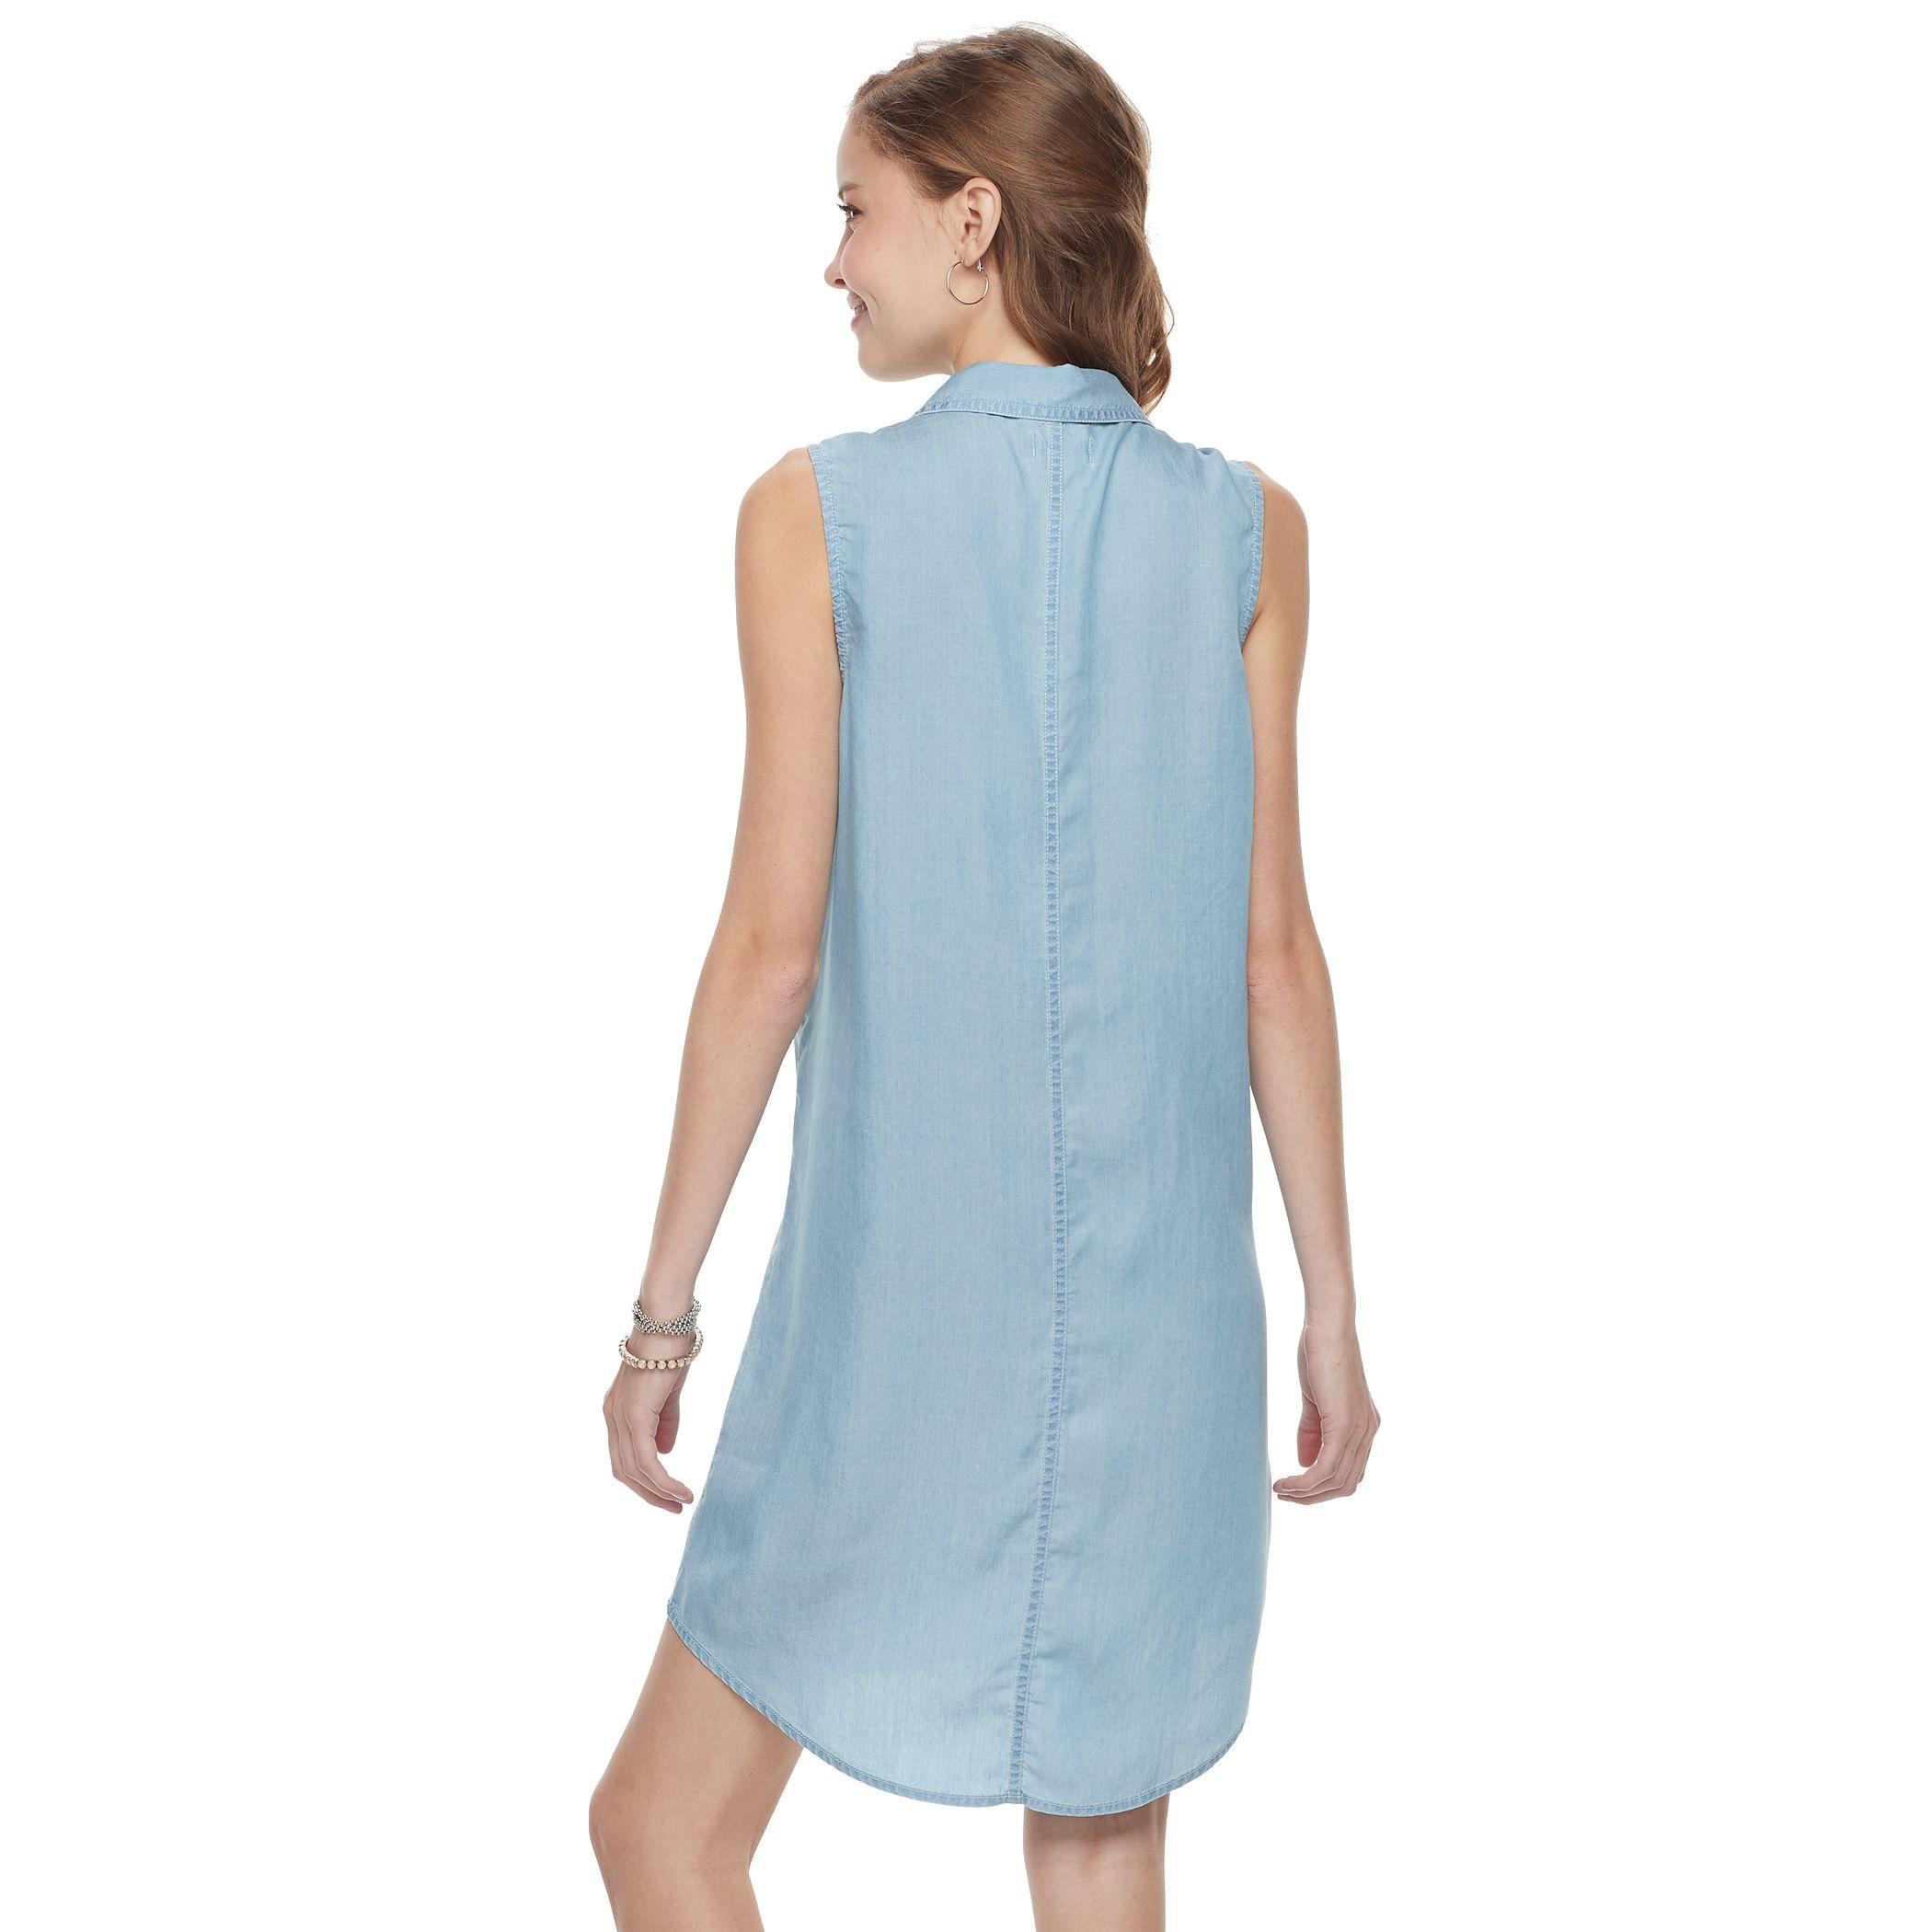 Juniors Patriotic Dresses, Clothing | Kohl\'s